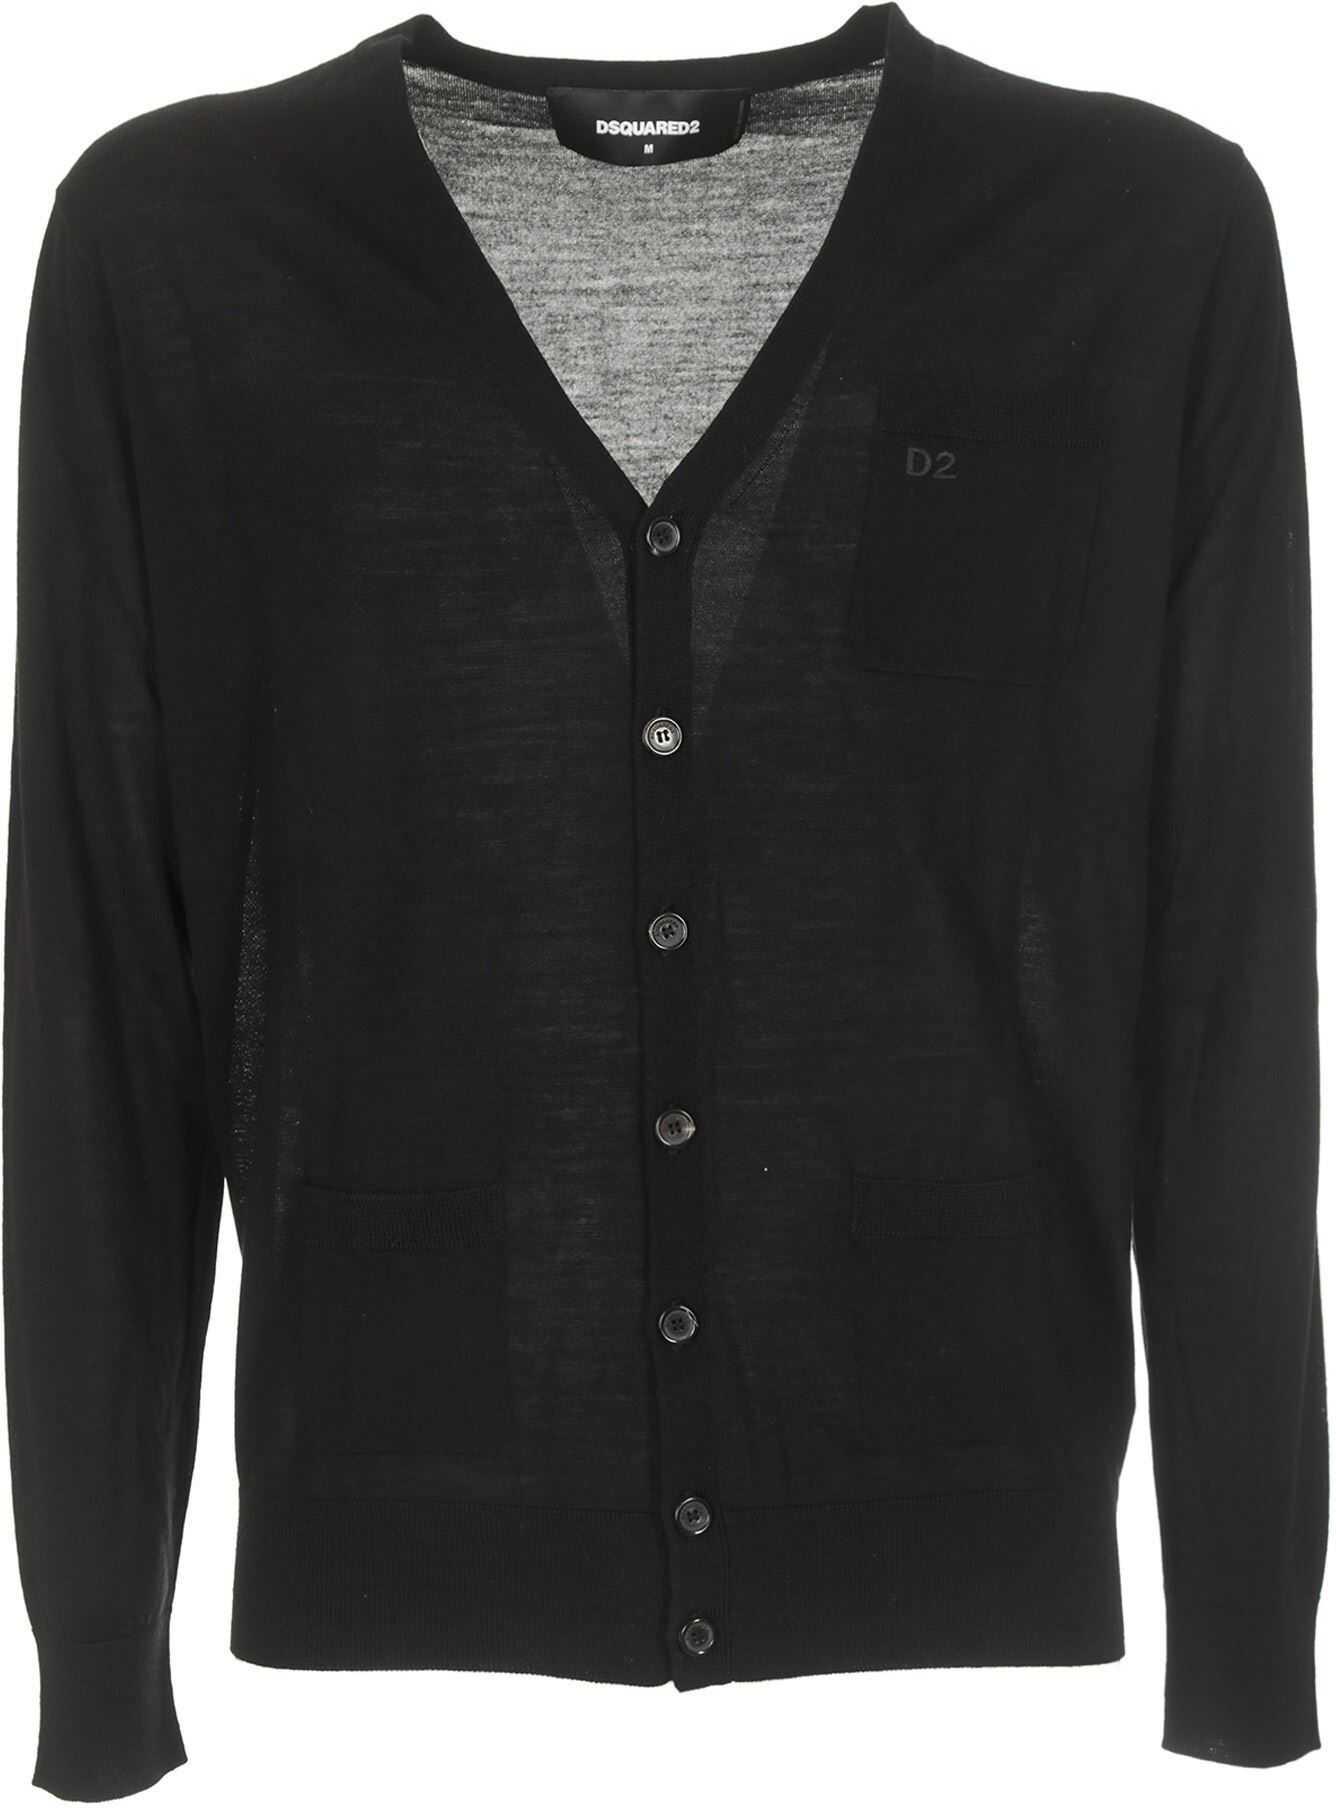 DSQUARED2 Wool Cardigan In Black Black imagine